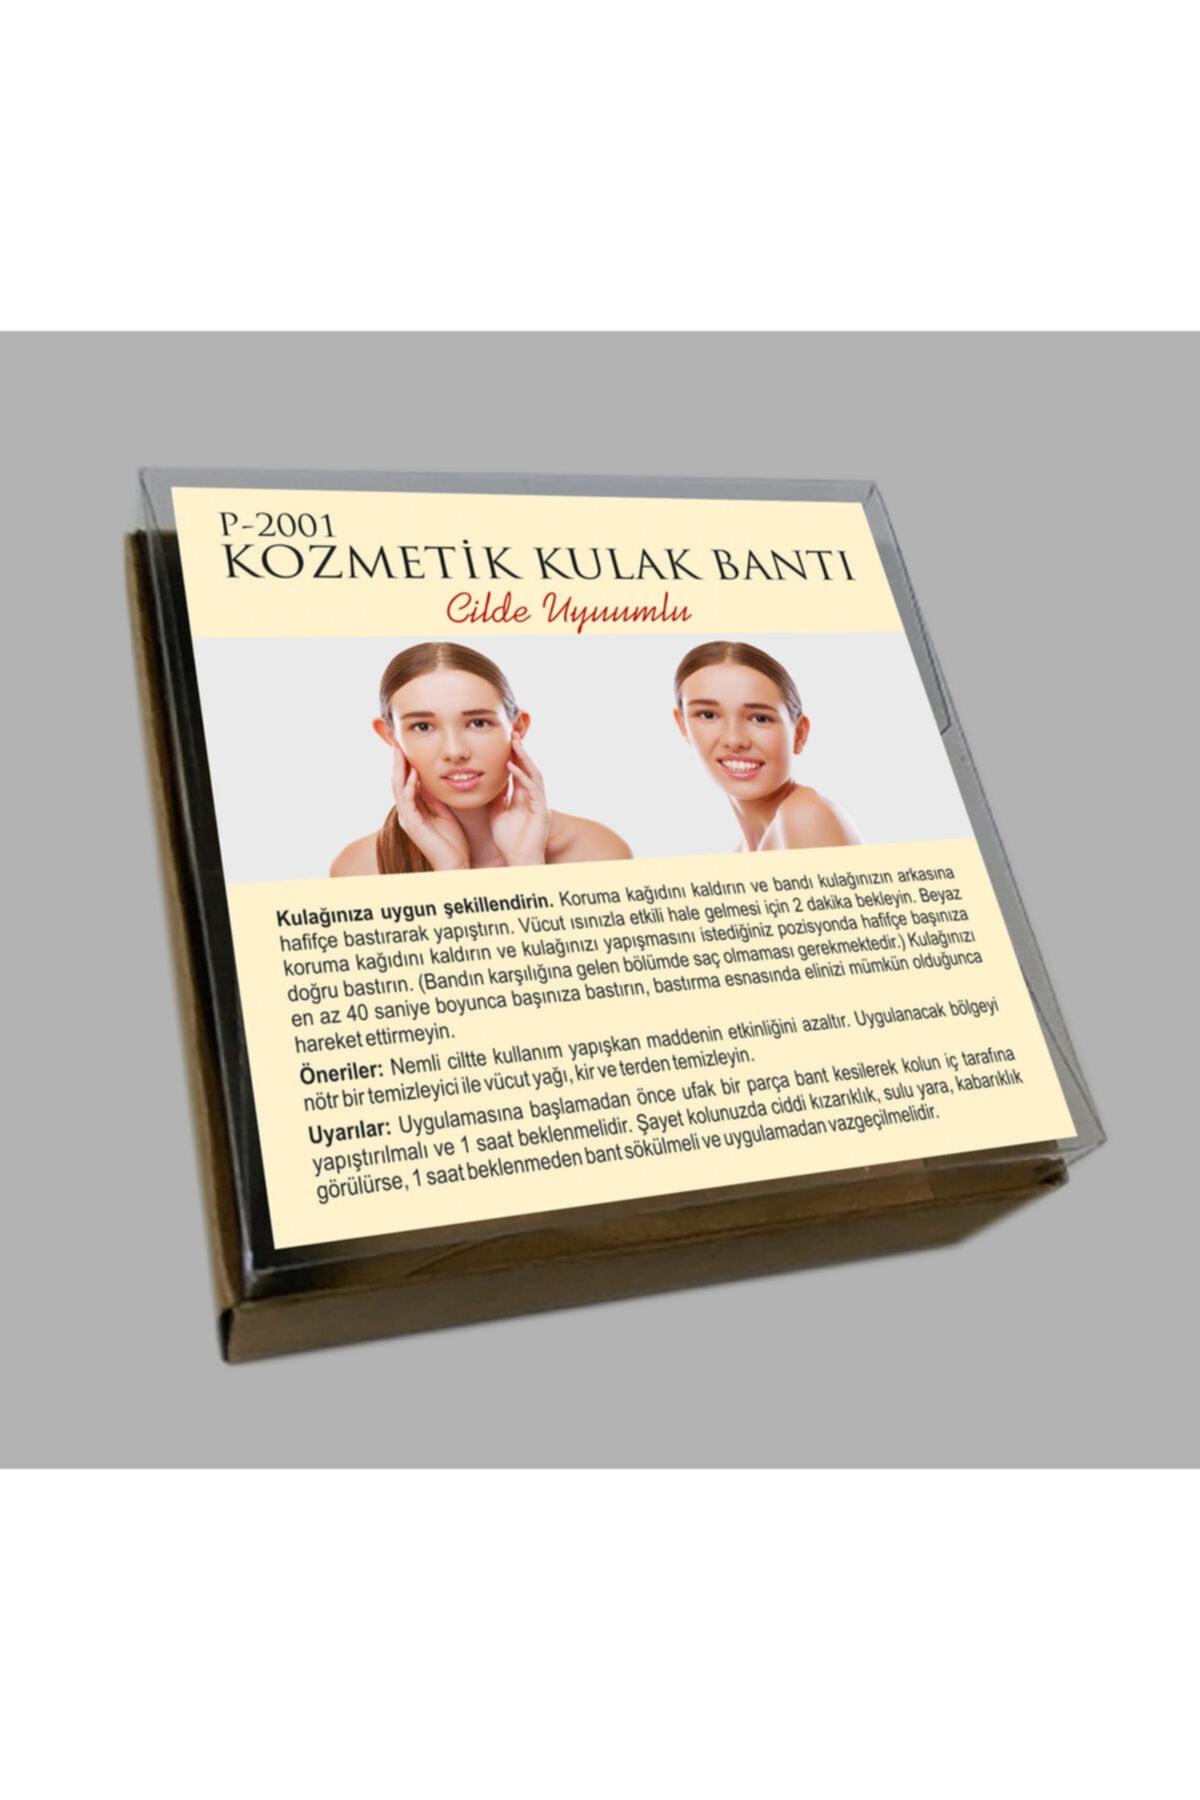 P2001 Kepçe Kulak Düzeltici Kozmetik Bant 1